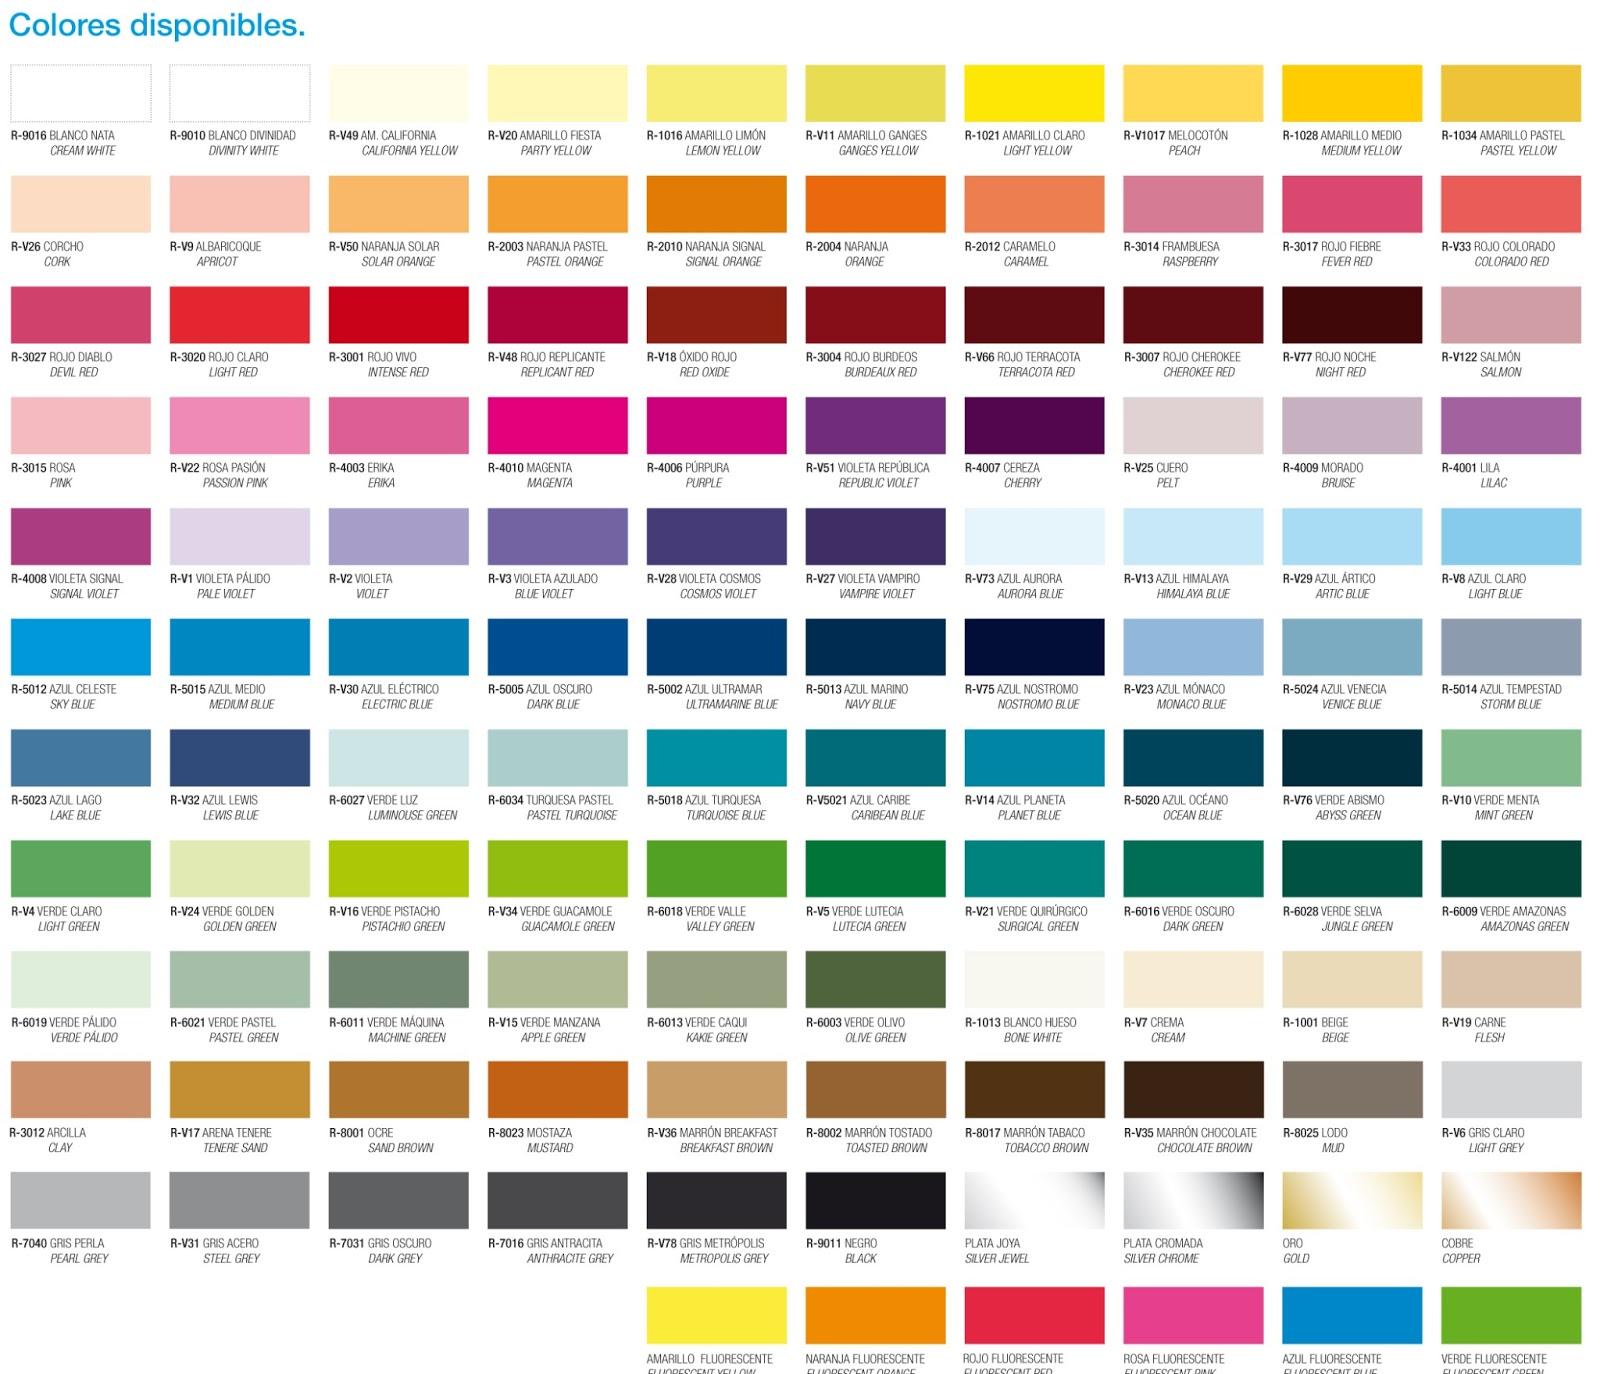 Catalogo De Colores De Pinturas - Novocom.top